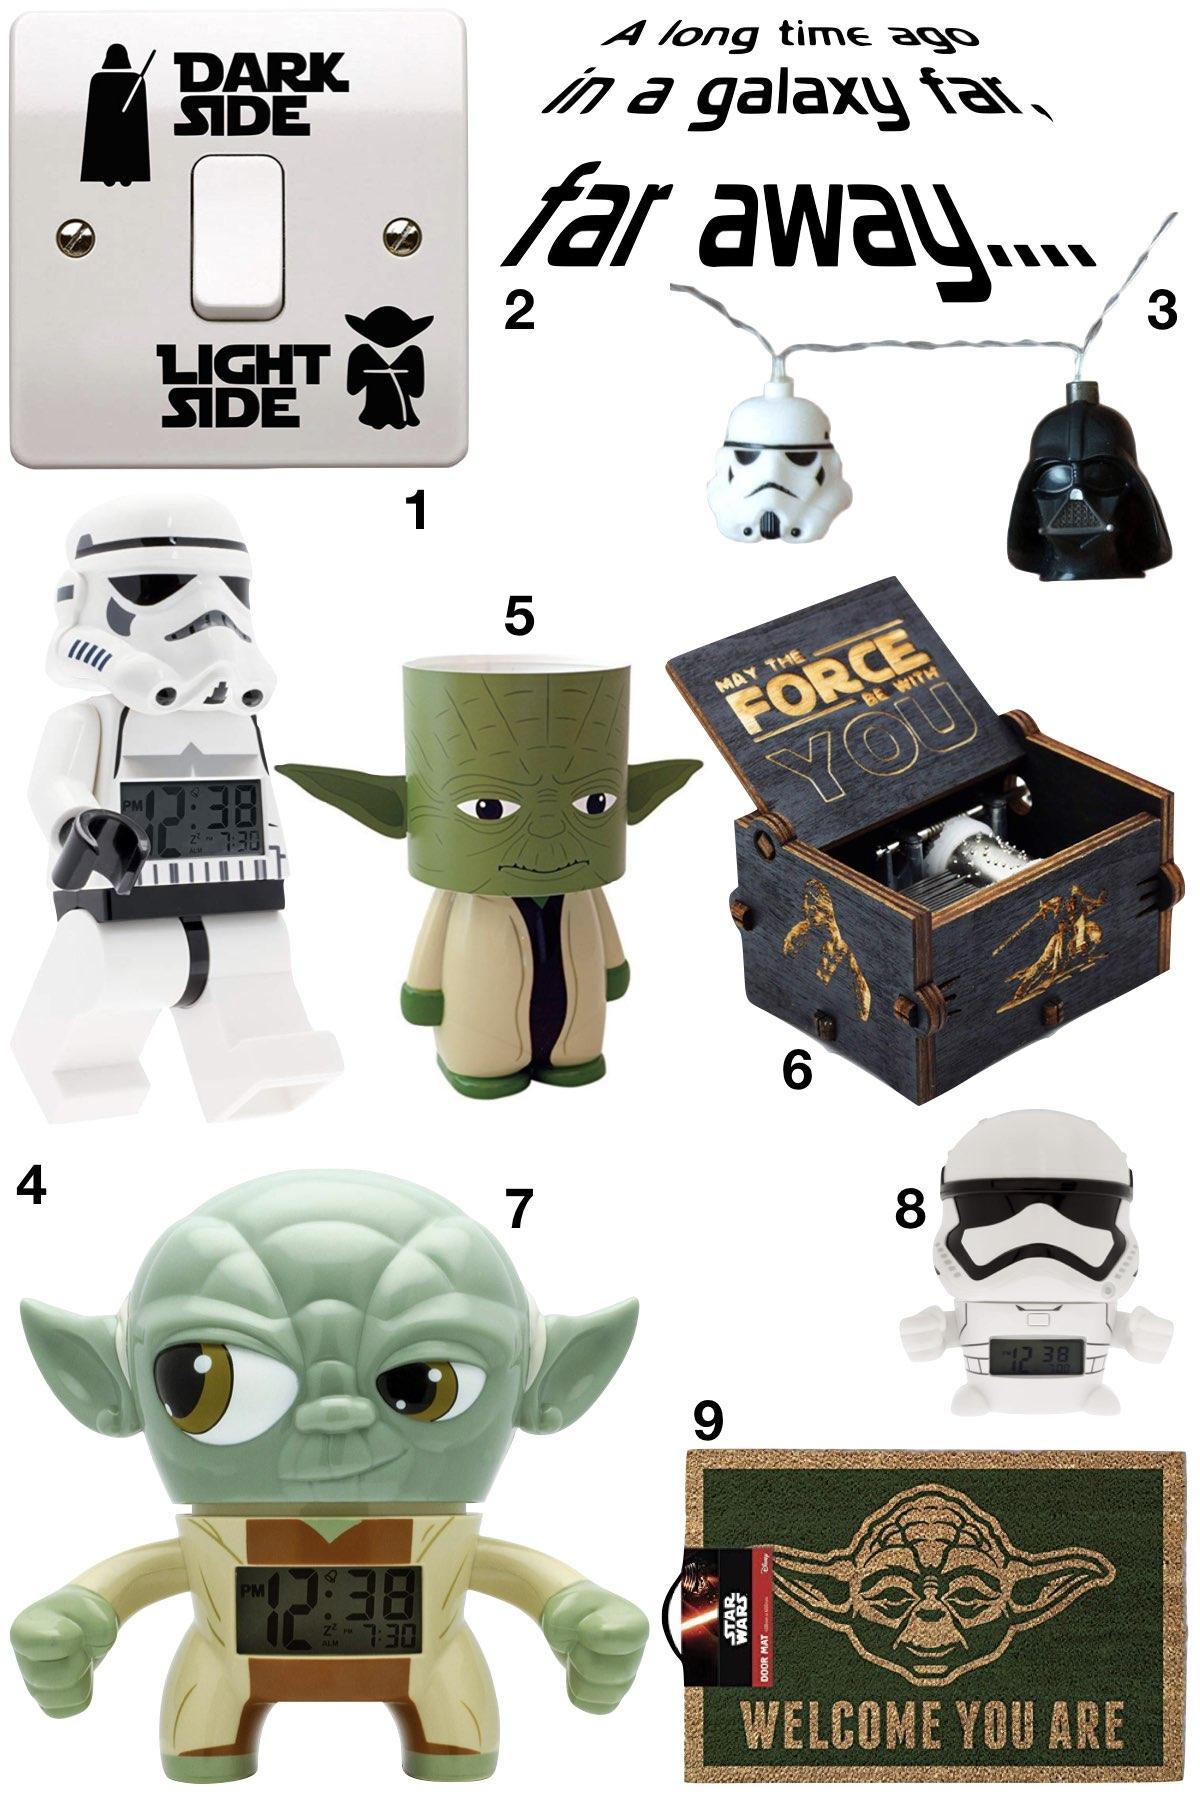 anniversaire thème star wars idée cadeau drôle yoda storm trooper dark vador - blog déco - clem around the corner